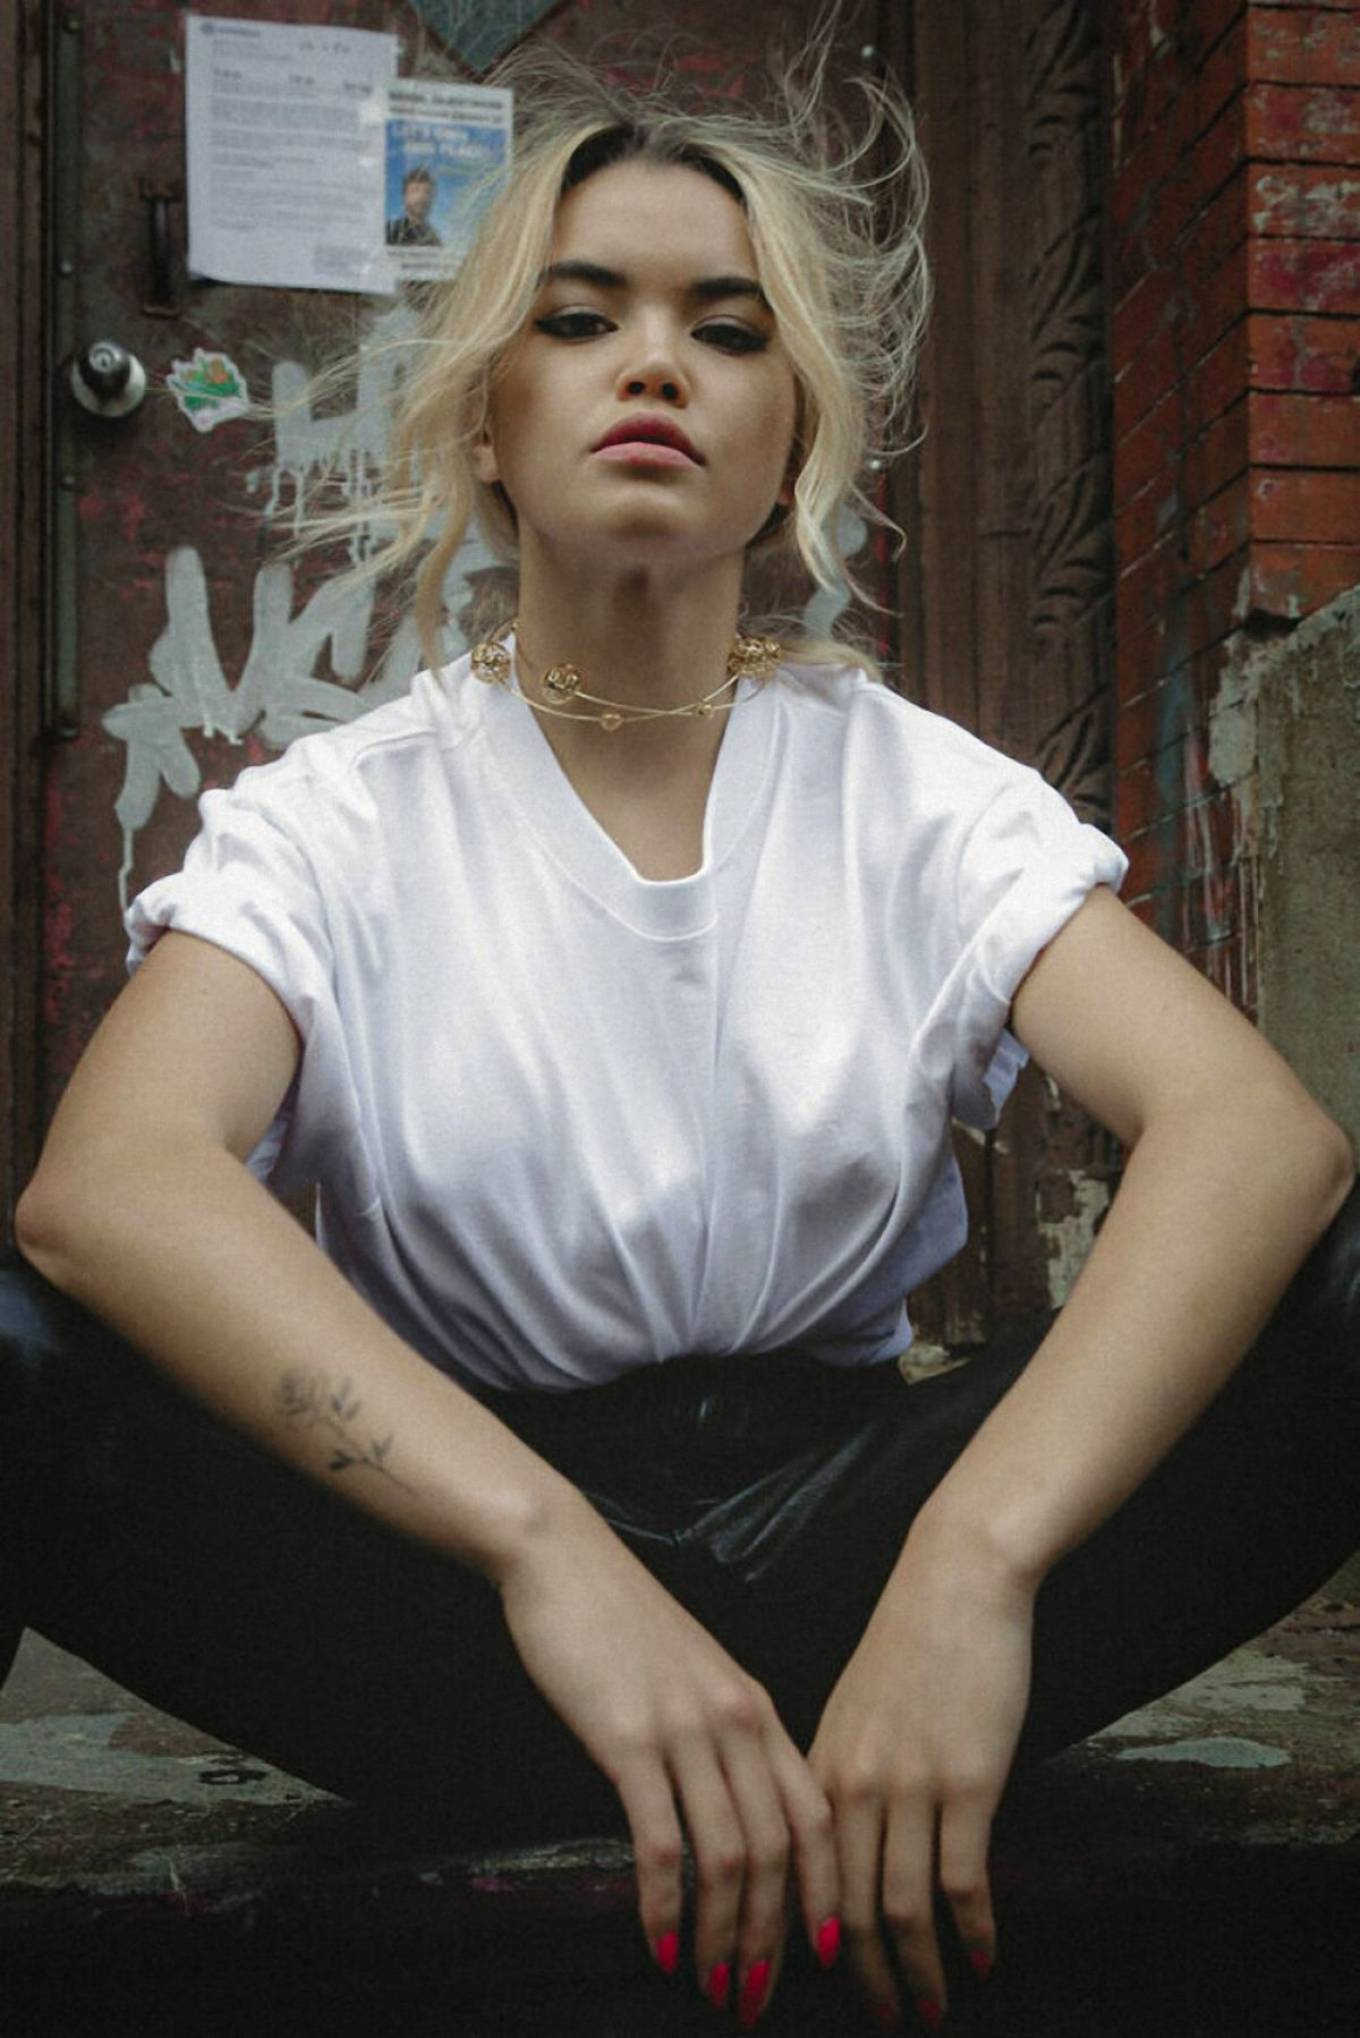 Paris Berelc - Photoshoot for Dlarez Magazine